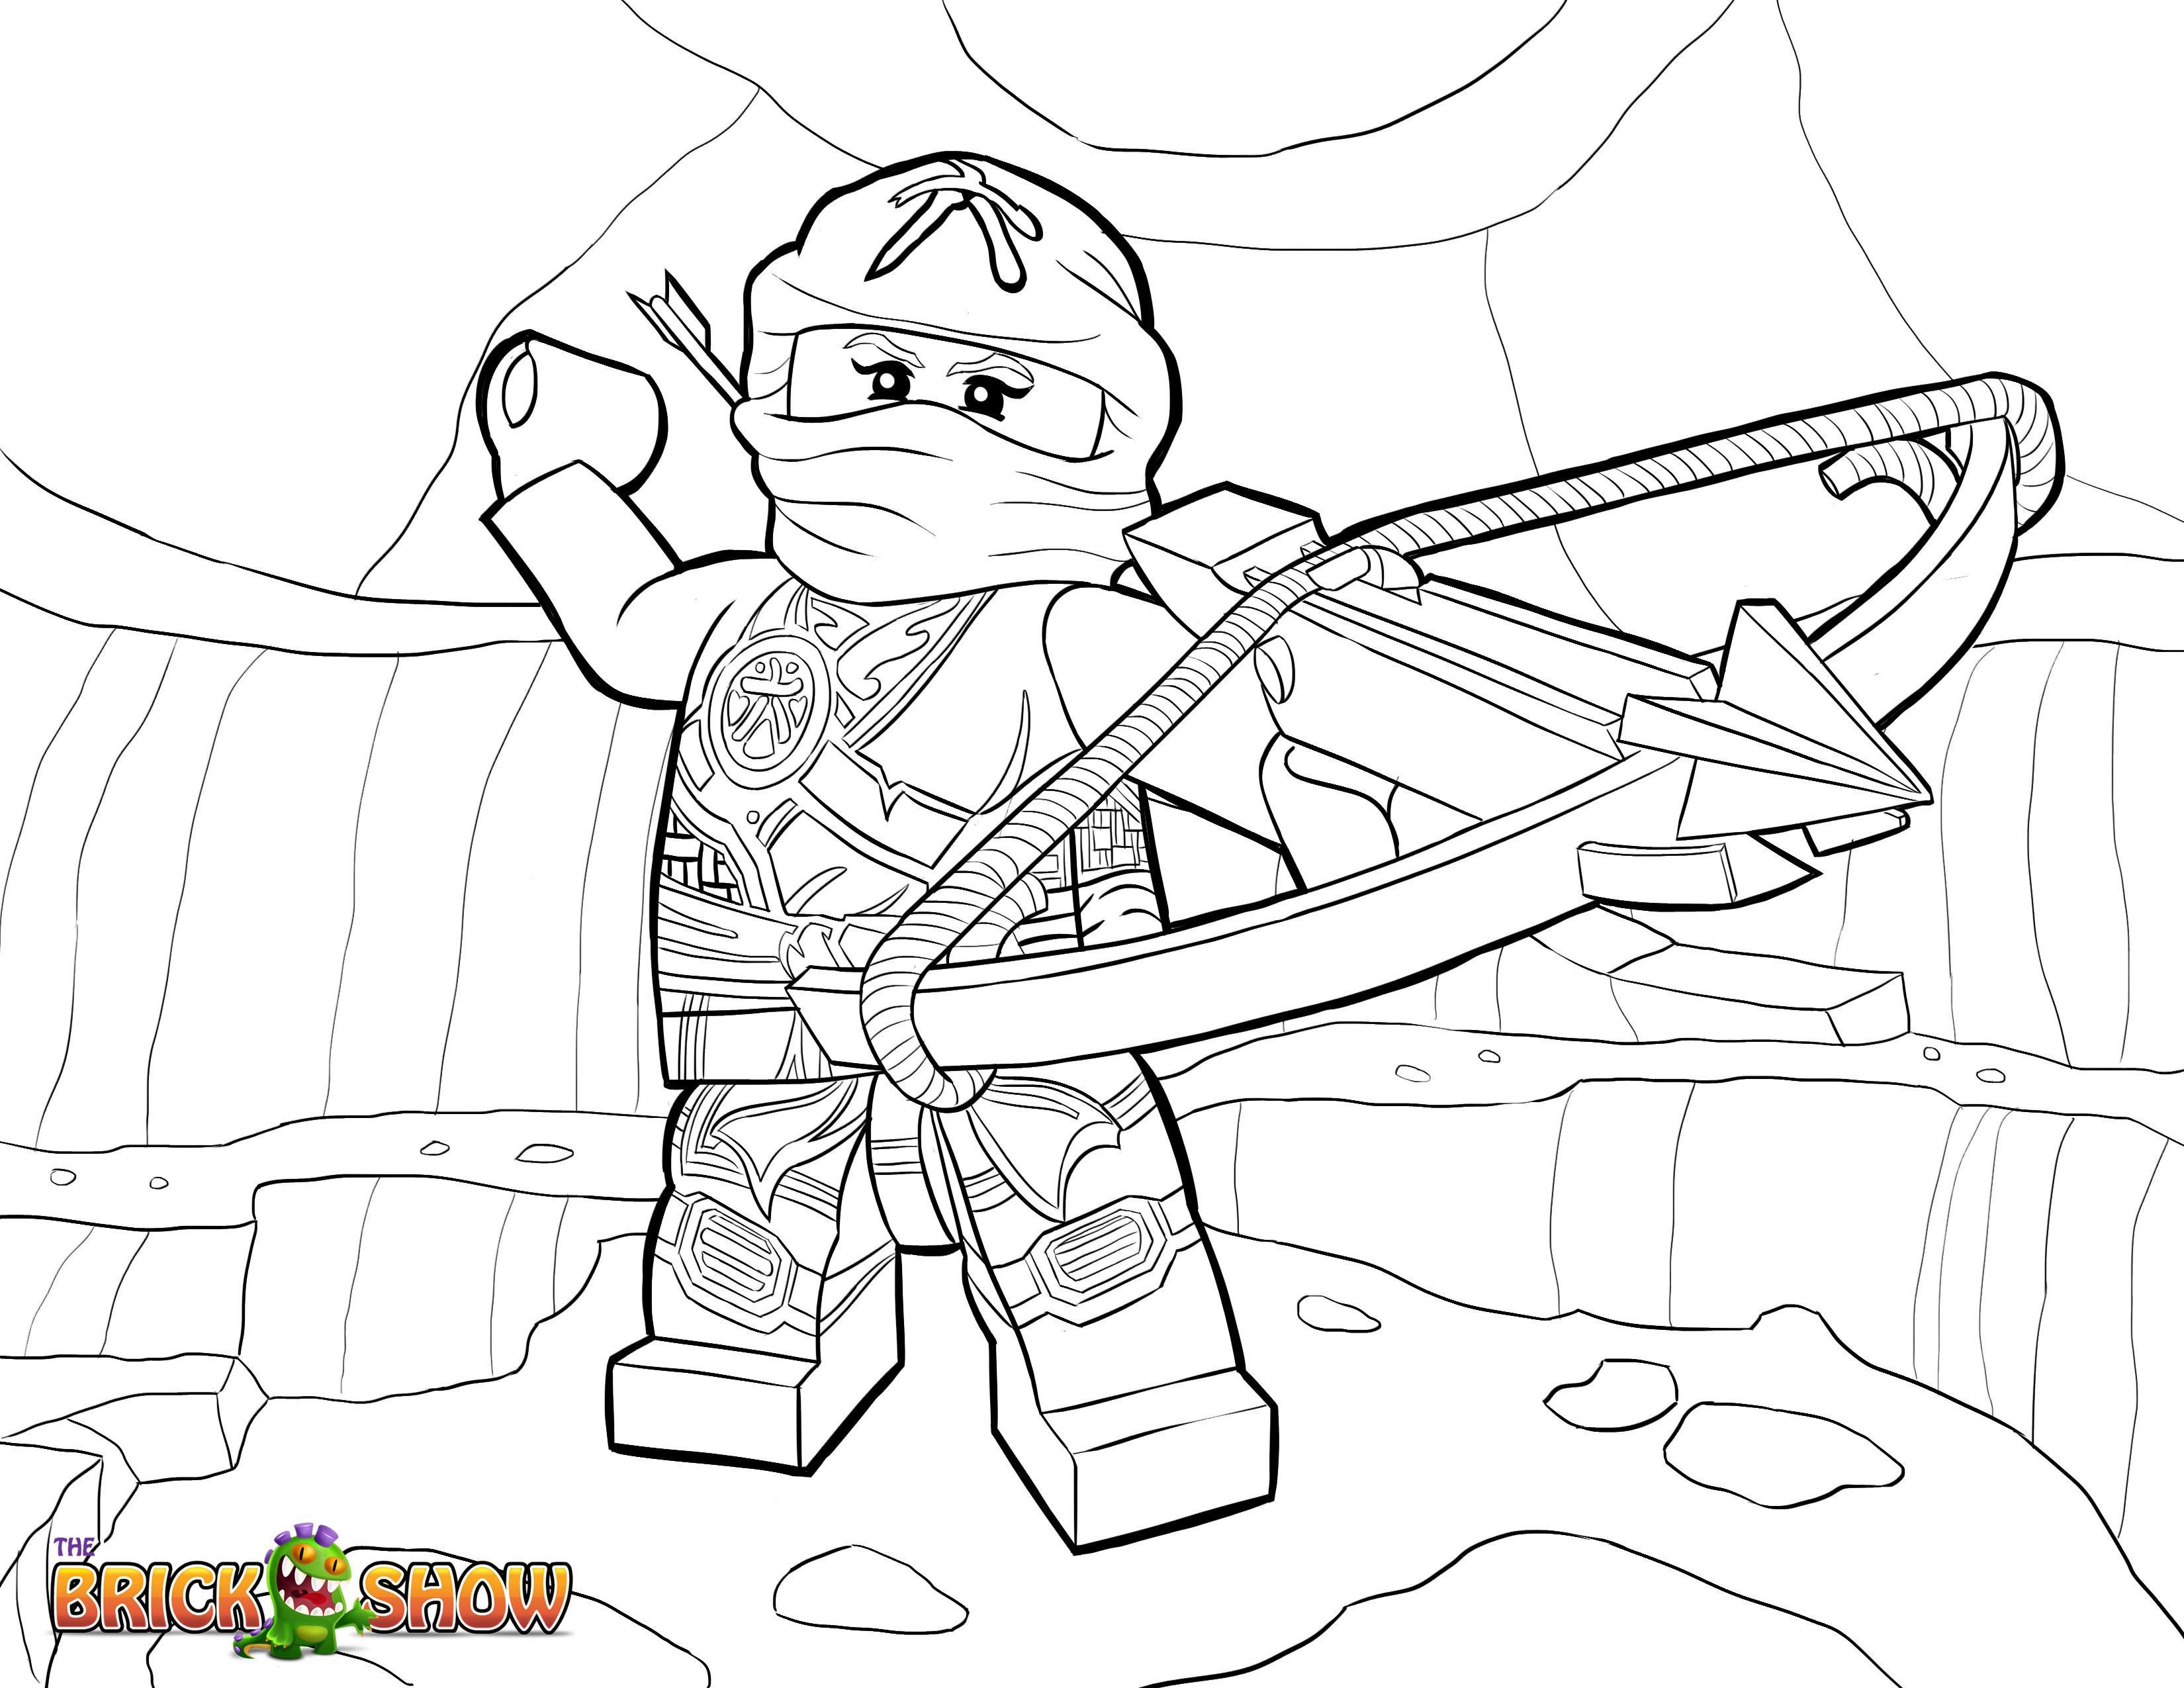 Ninjago Lego Ausmalbilder Einzigartig 40 Ninjago Ausmalbilder Zane Scoredatscore Frisch Lego Ninjago Fotos